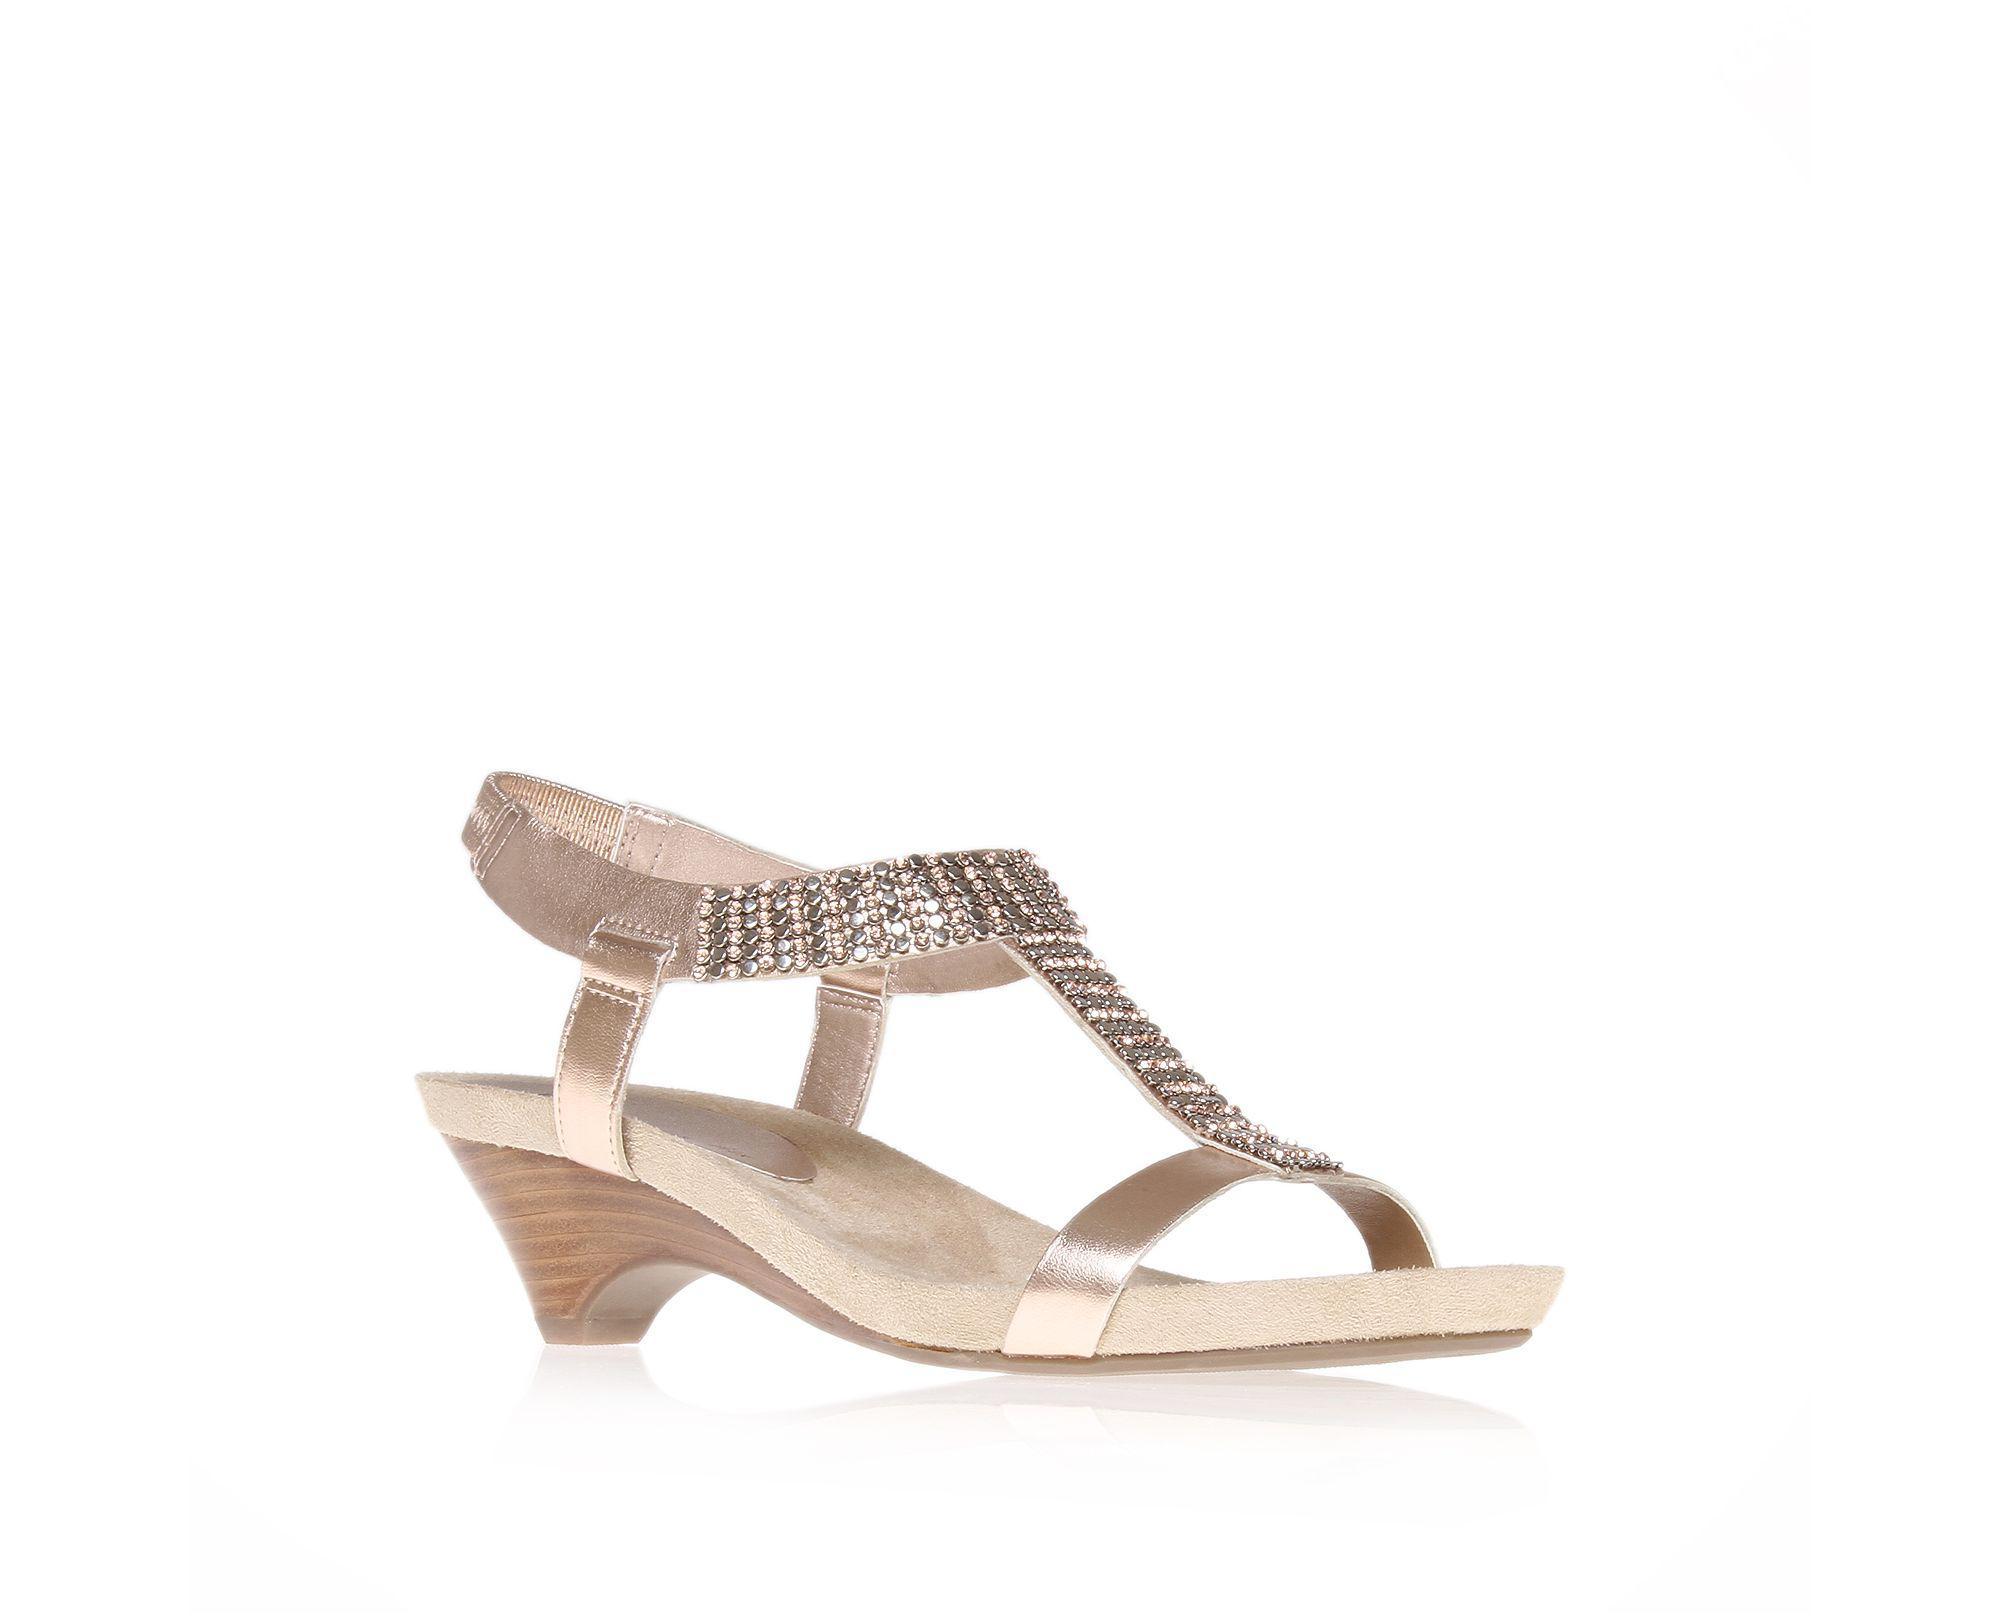 aca9ce829af Anne Klein Teale3 Mid Heel Gladiator Sandals in Pink - Lyst